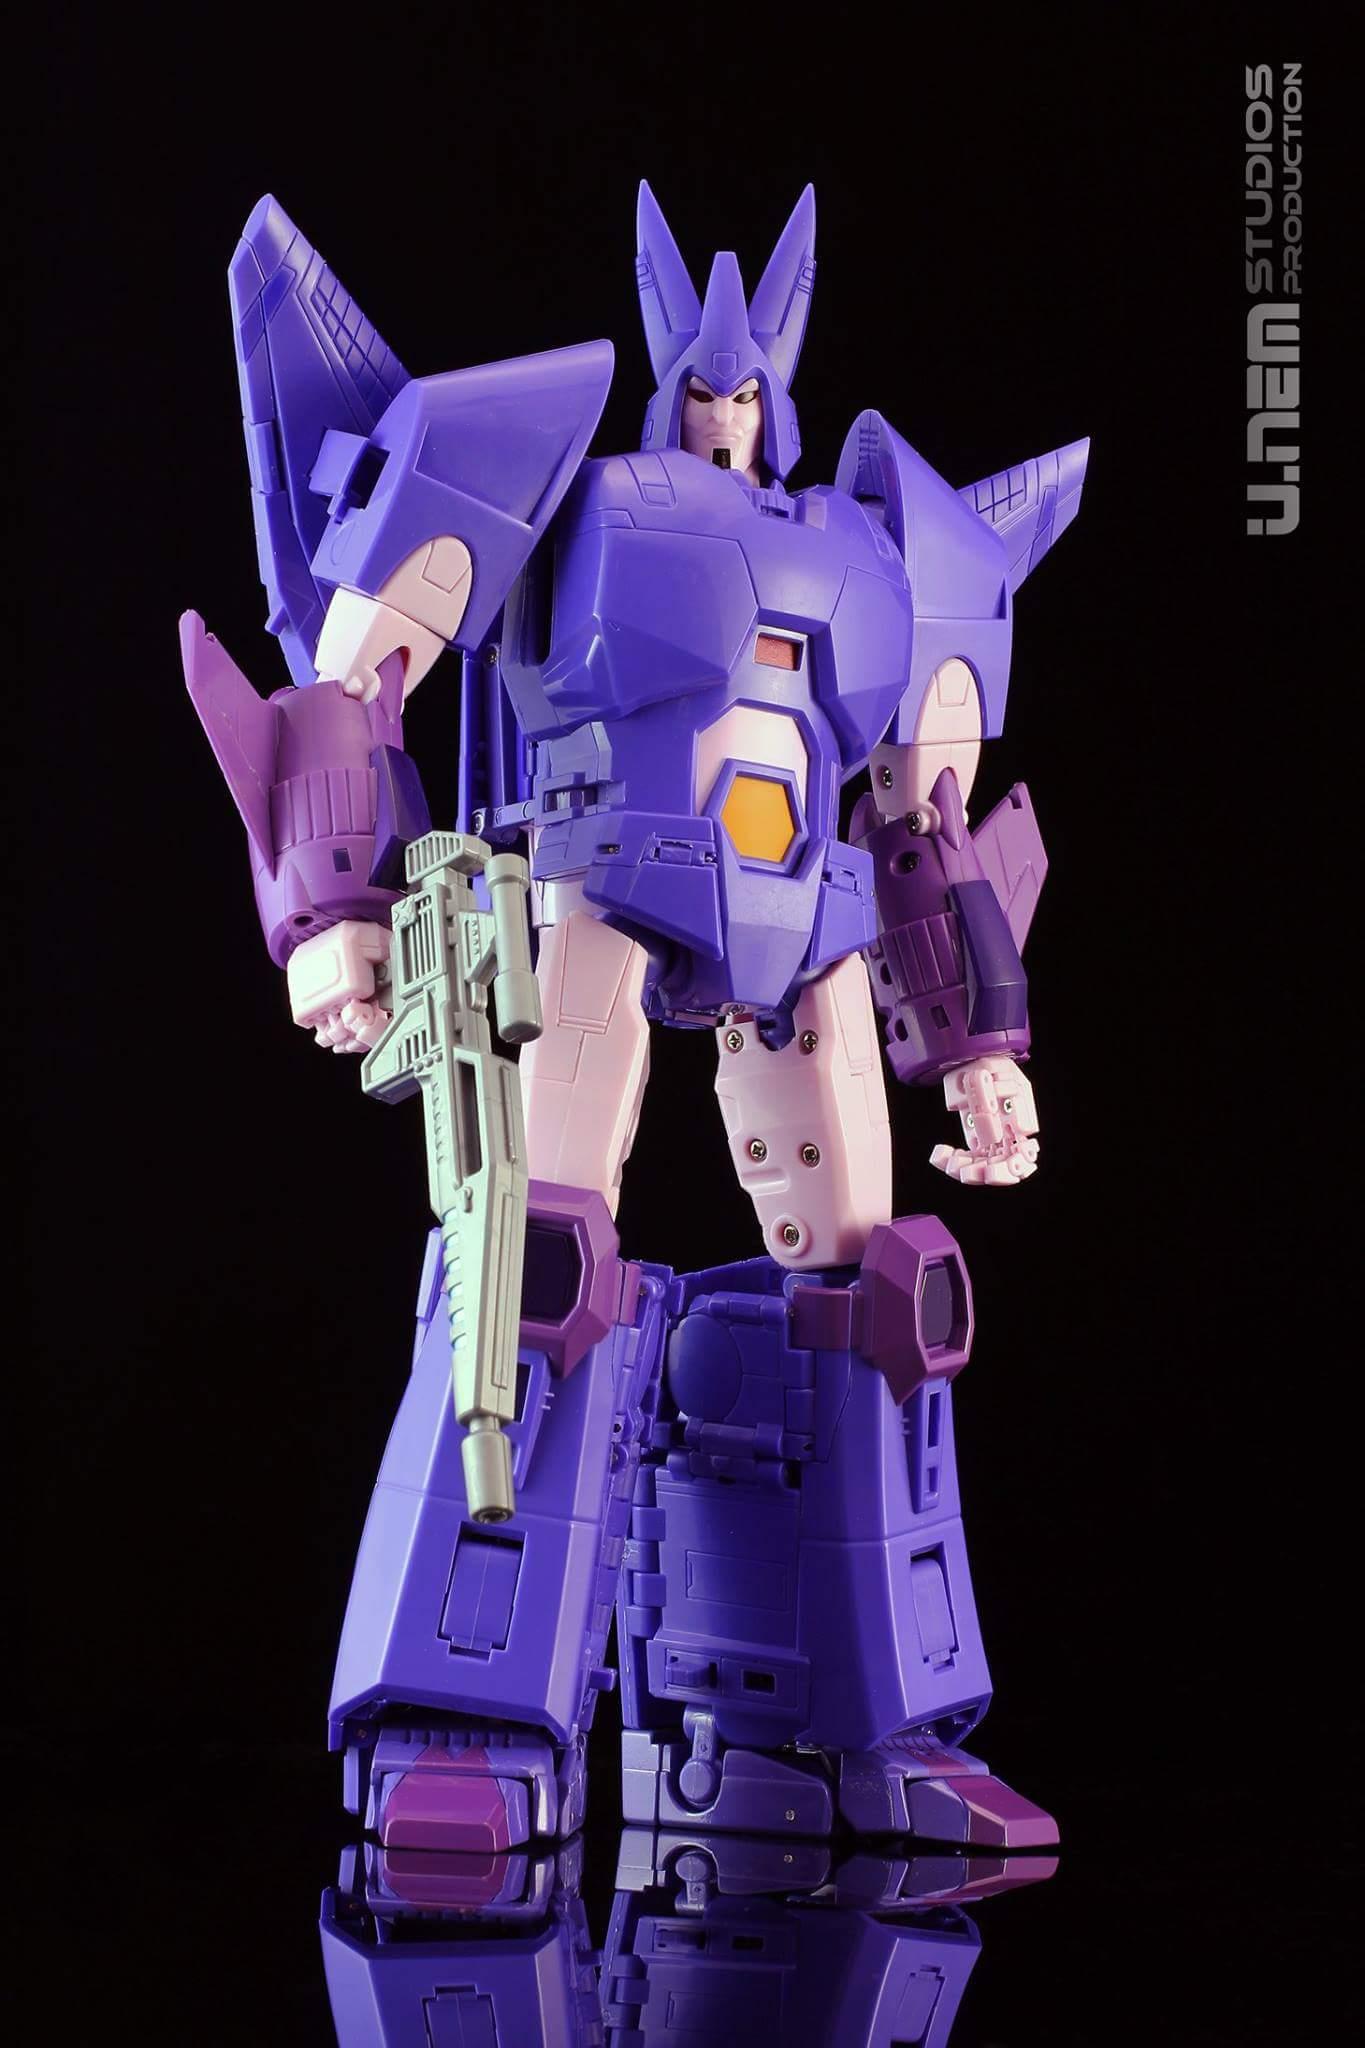 [X-Transbots] Produit Tiers - MX-III Eligos - aka Cyclonus - Page 3 DGDJtvNn